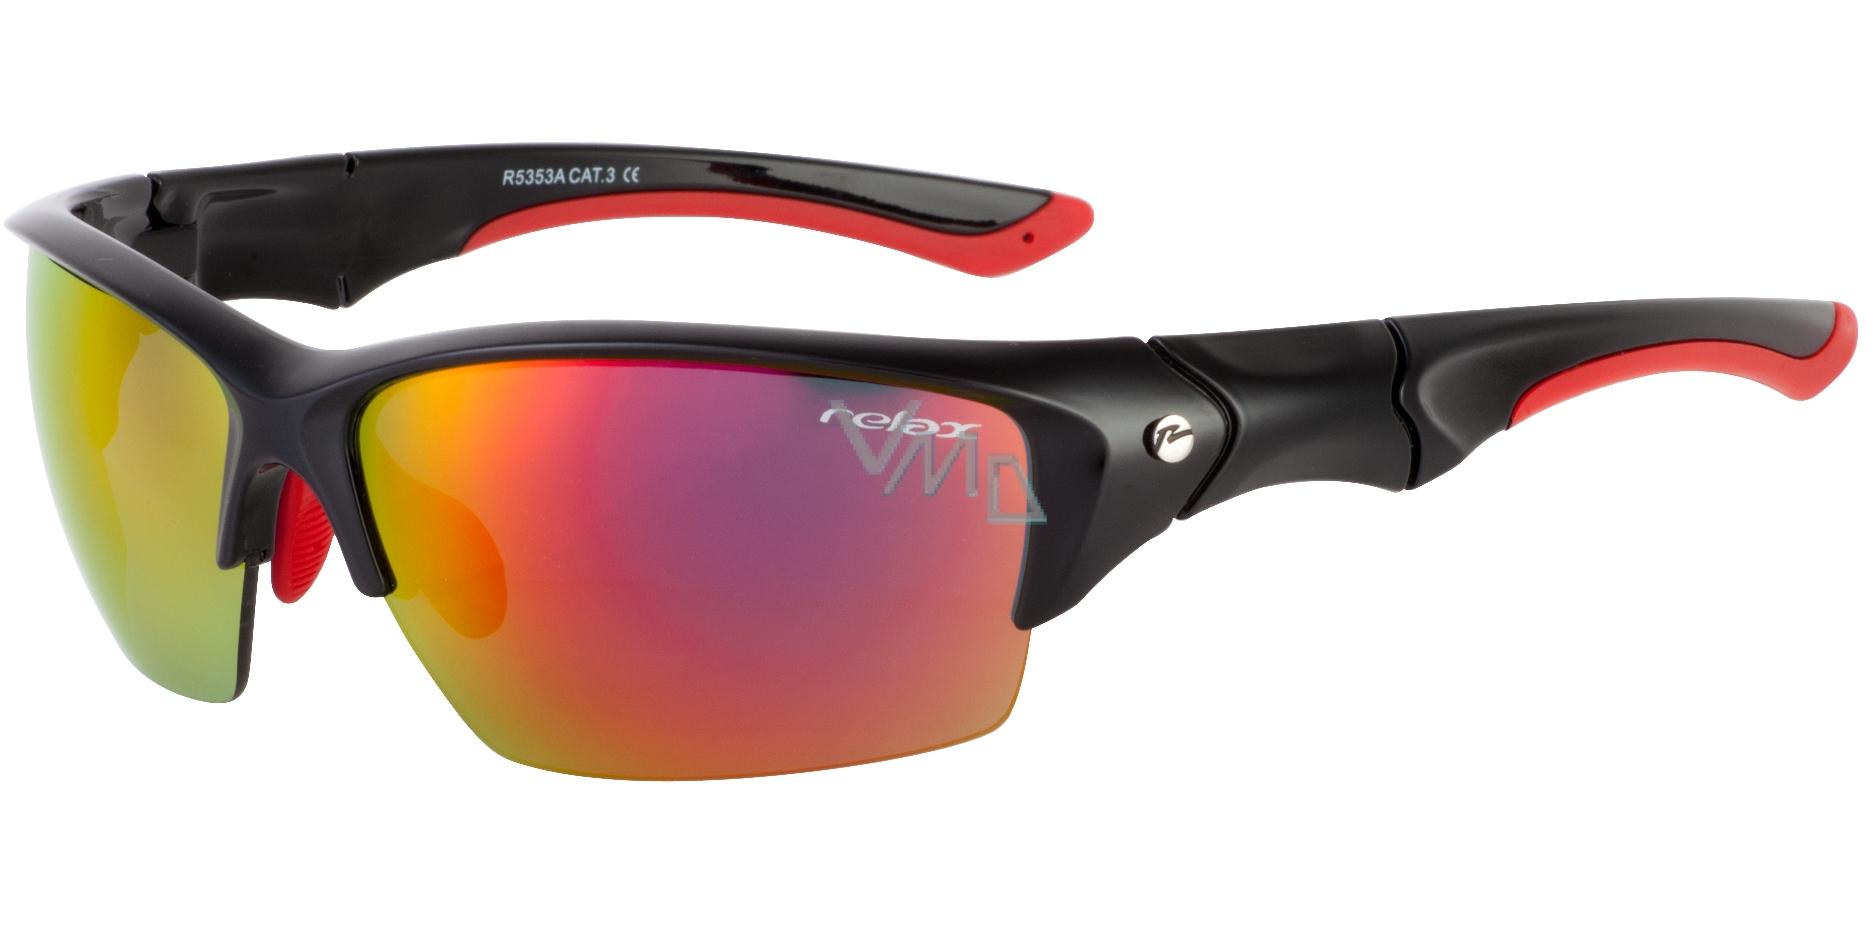 Relax Rakiura Sluneční brýle R5353A - VMD drogerie 764a06b0cfa